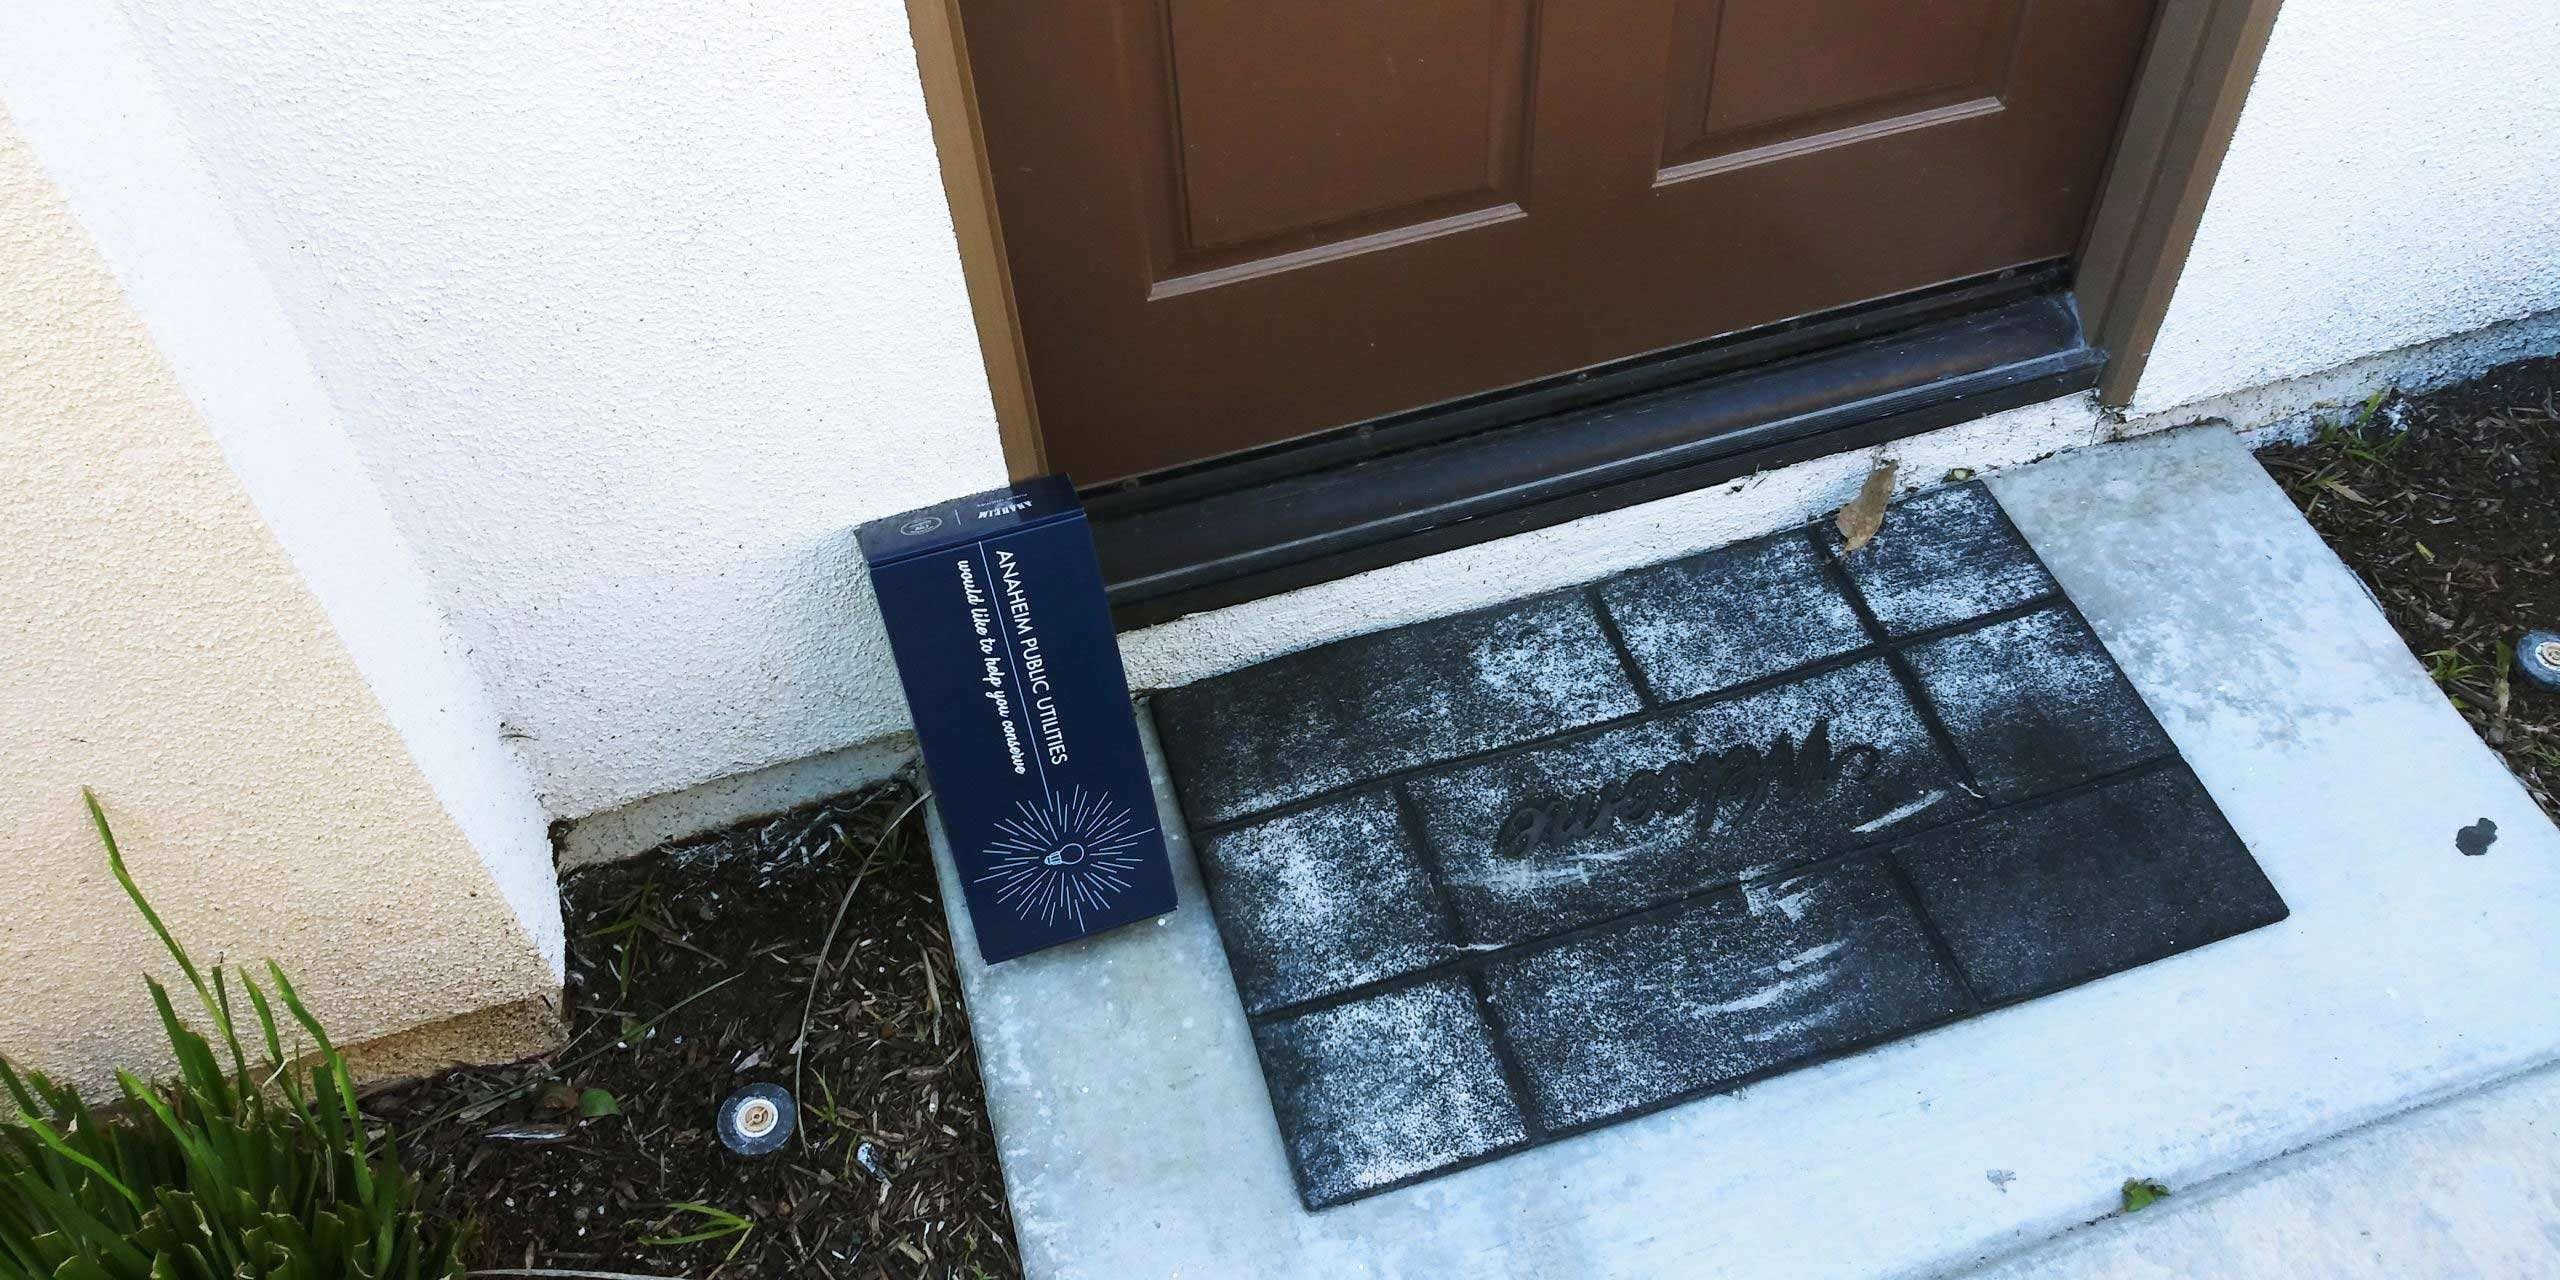 city of anaheim box on a doorstep